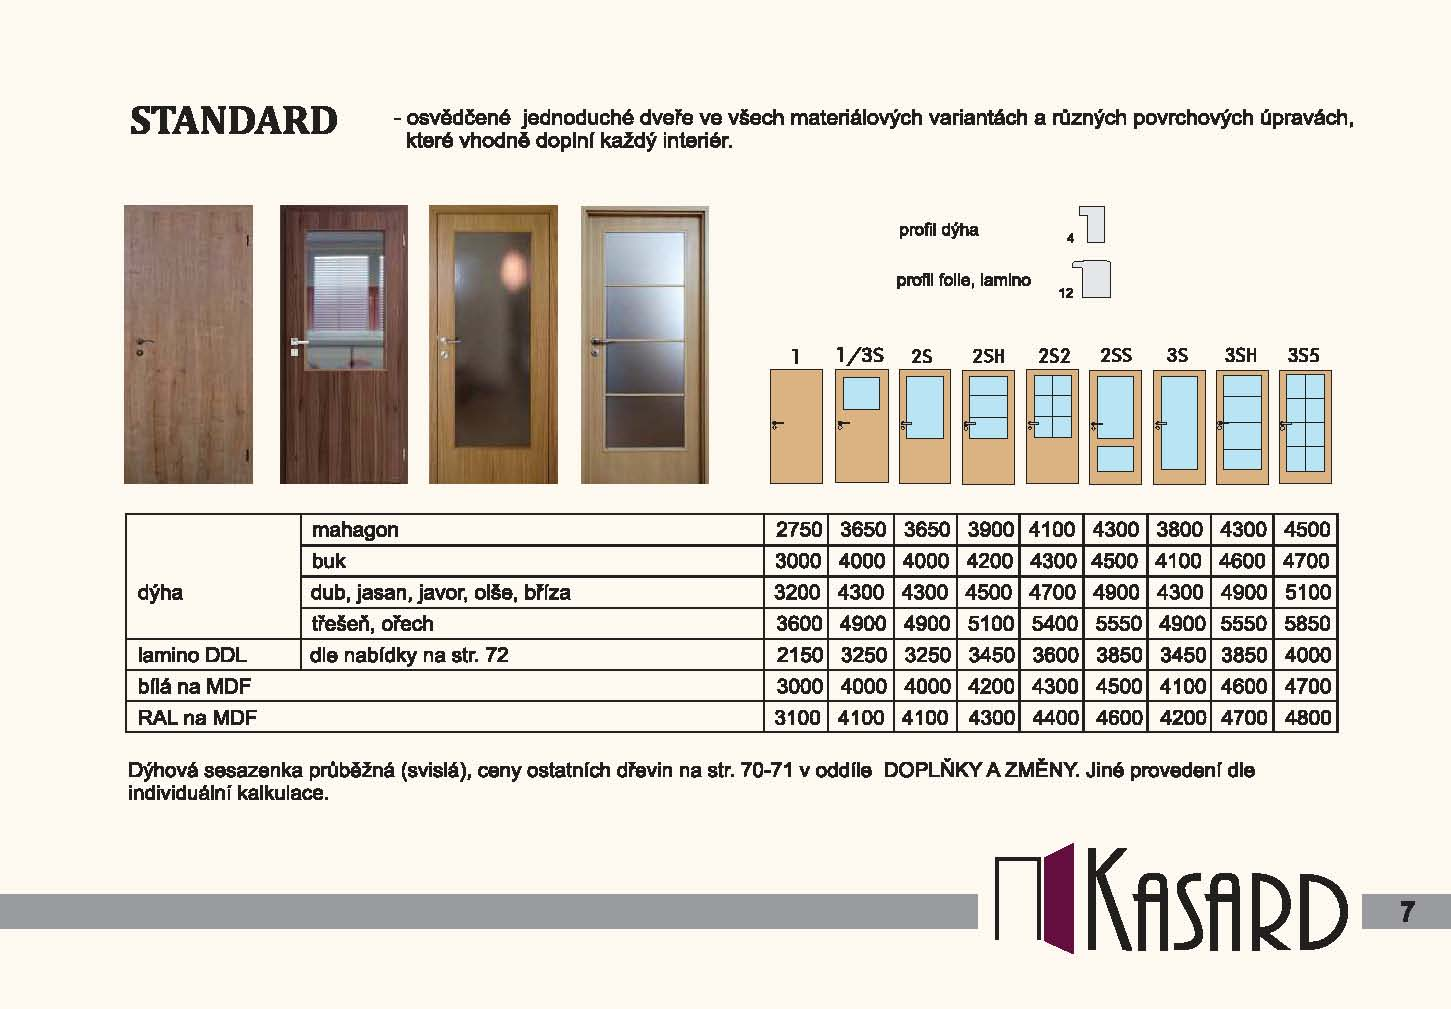 Interiérové dveře Kasard